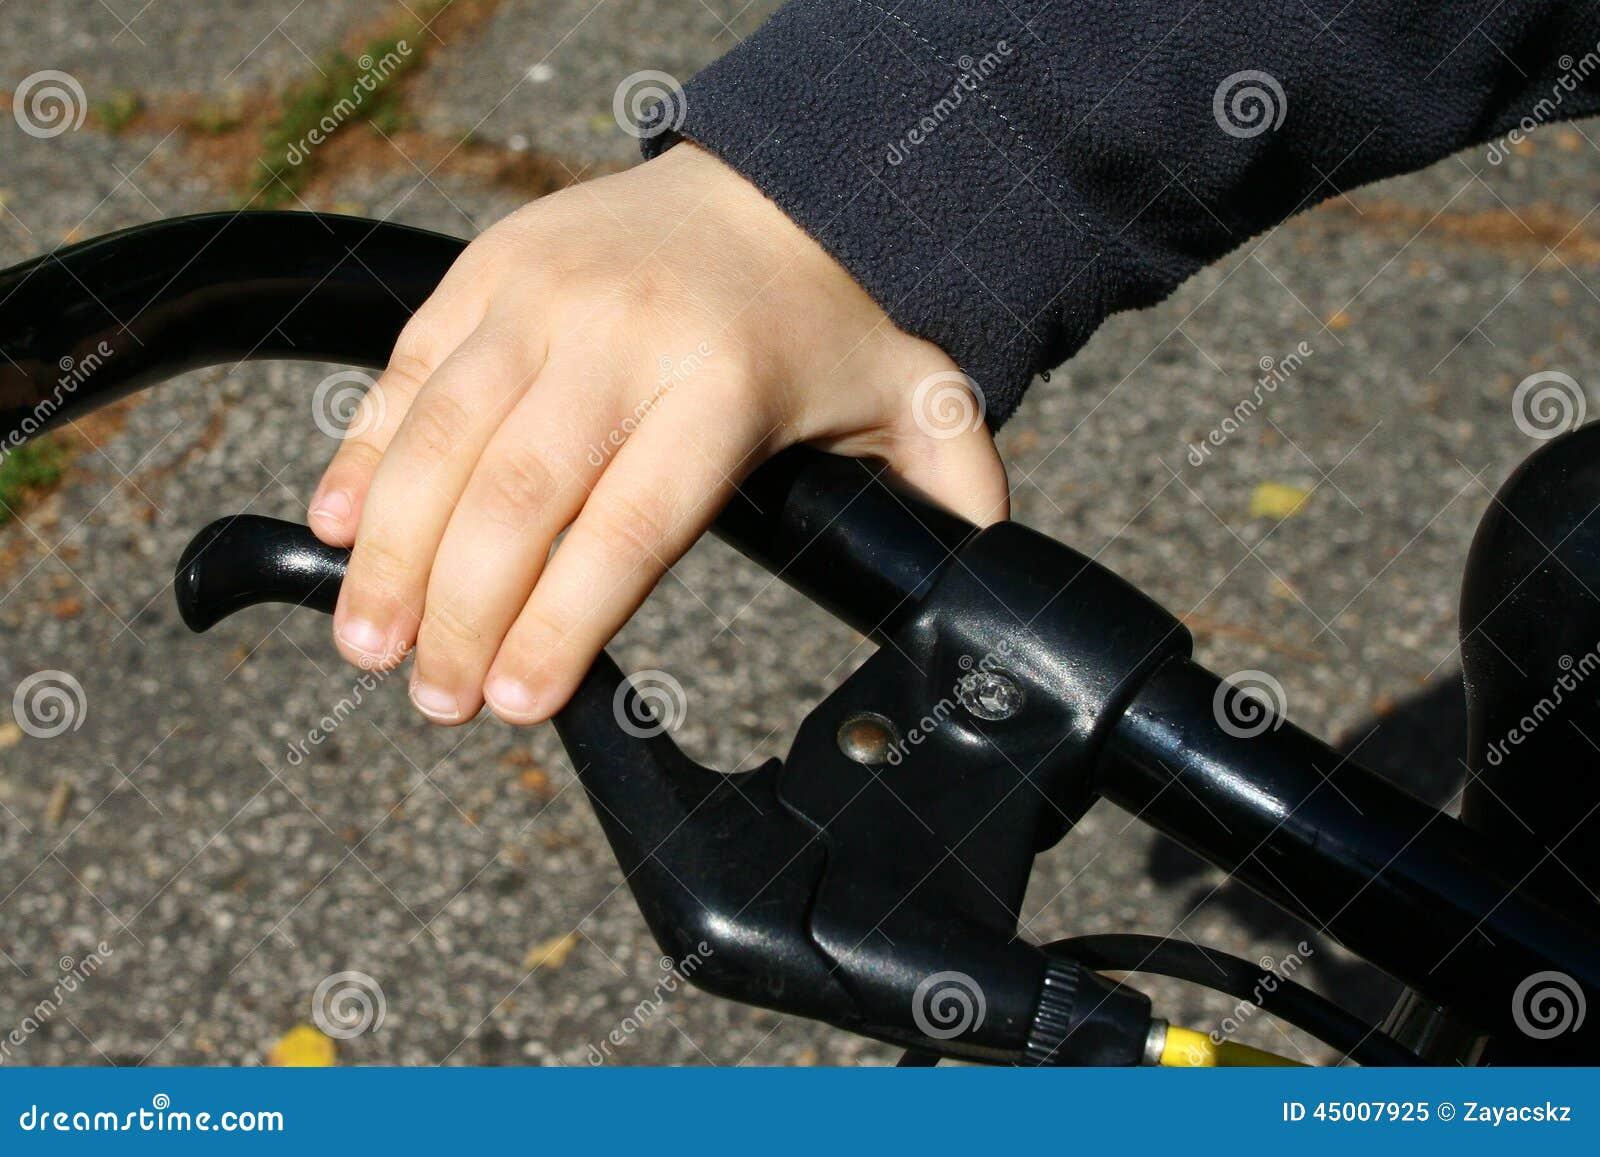 4 years old boy hand on black bicycle grip-brake